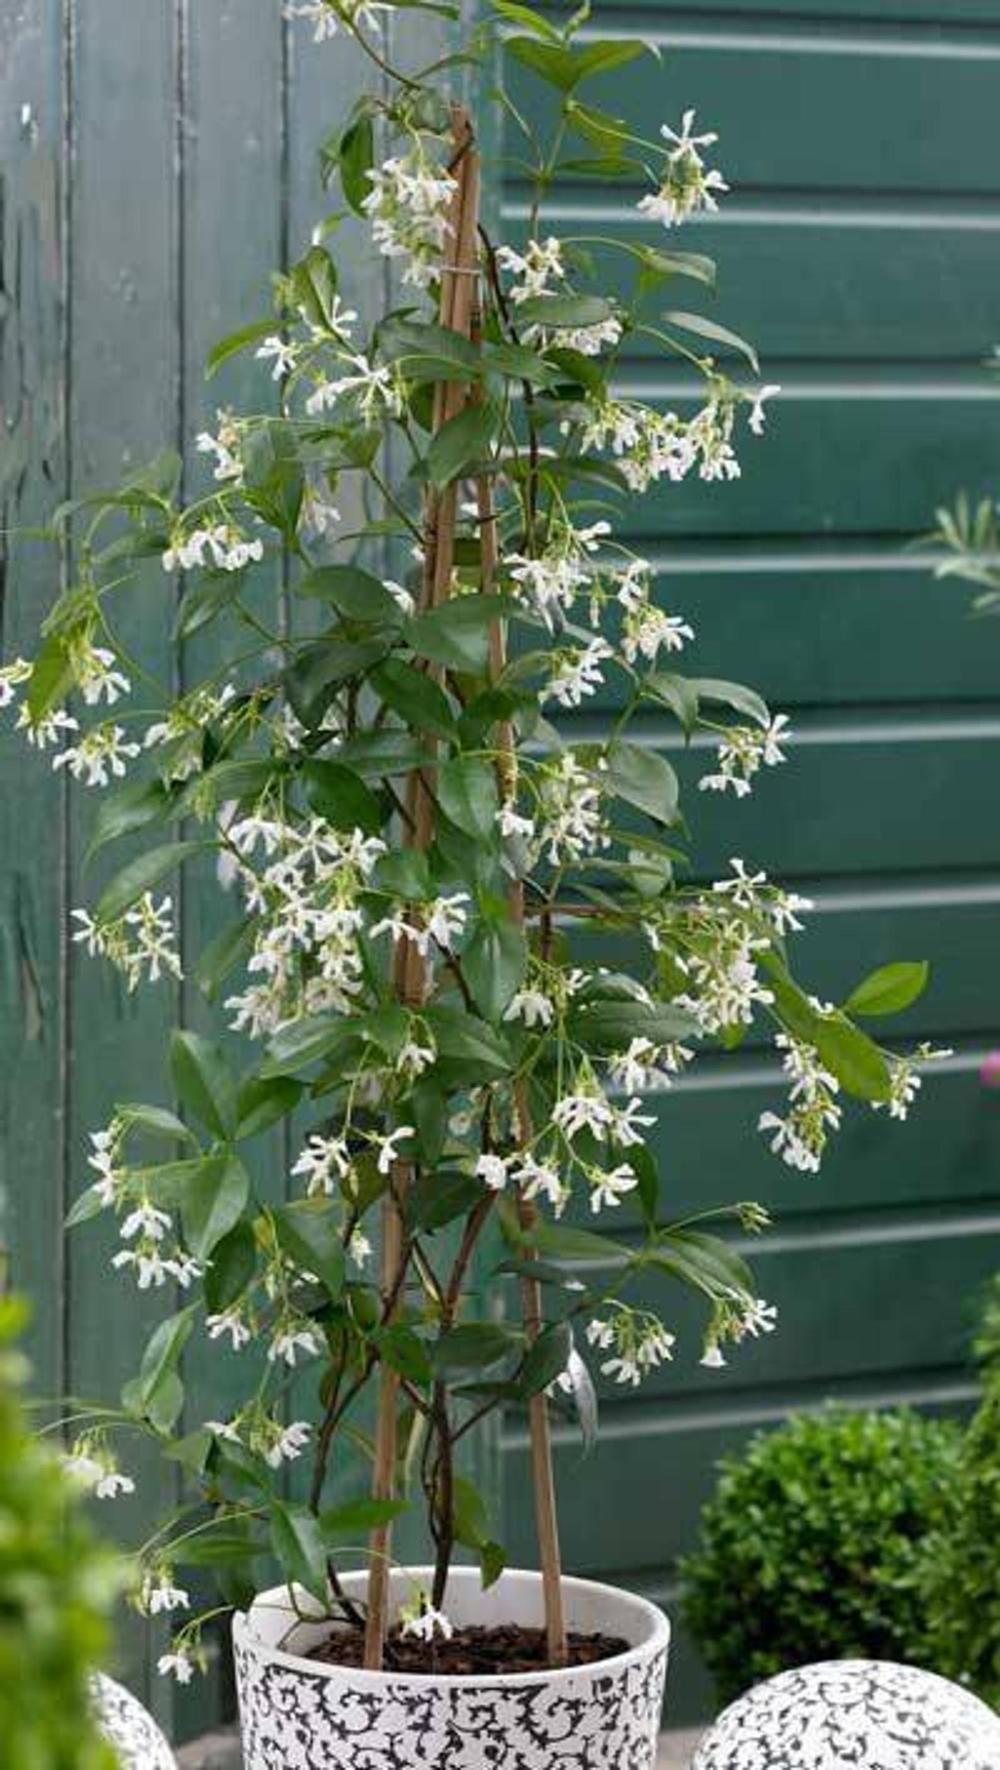 Star Plants Jasmine 3gallon Etsy In 2021 Climbing Plants Jasmine Plant Plants